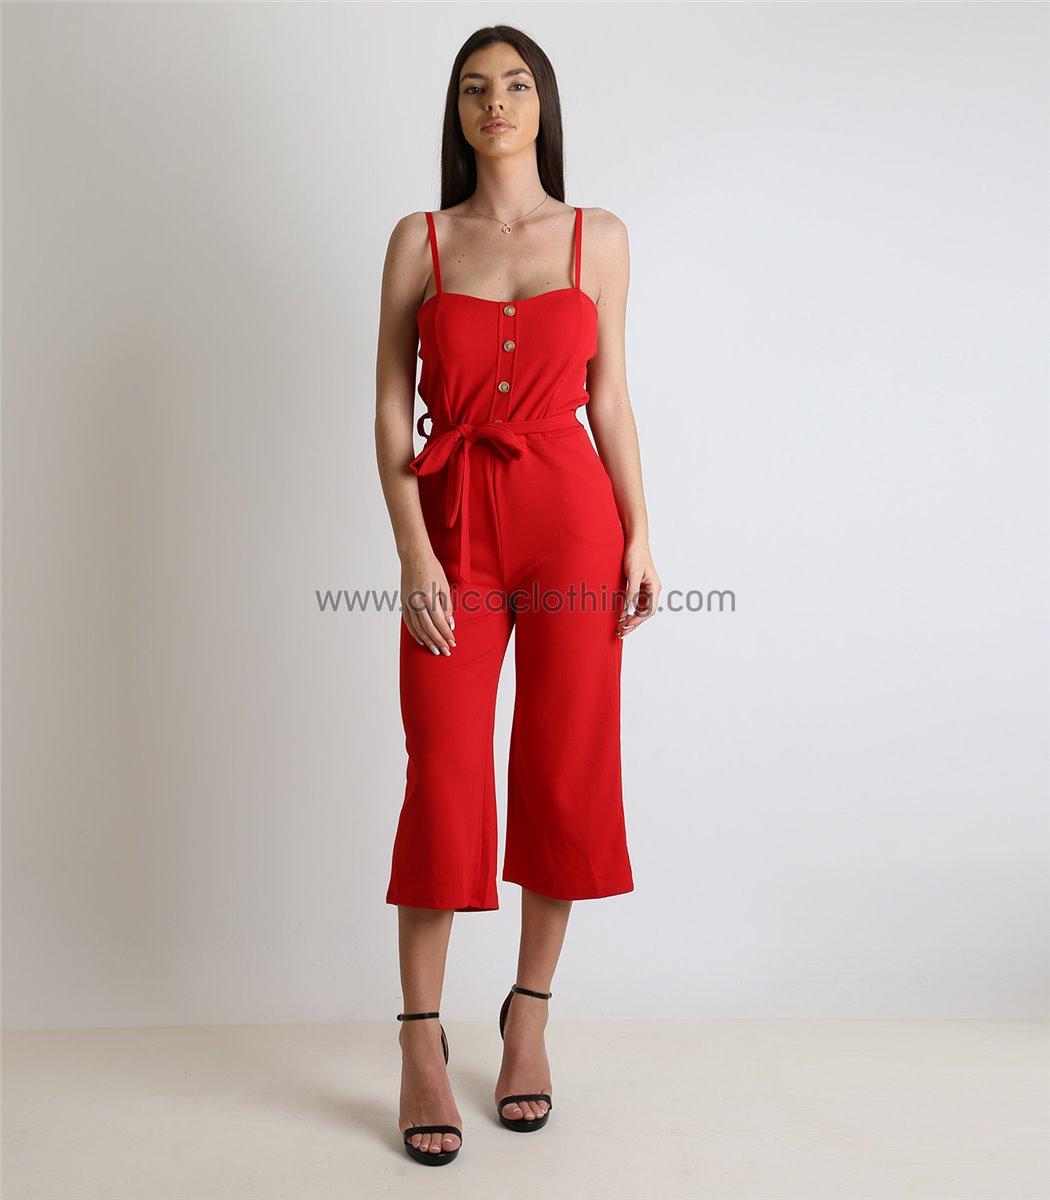 91be2e9783b0 Γυναικεία ολόσωμη φόρμα με κουμπιά και ζώνη (Κόκκινο)